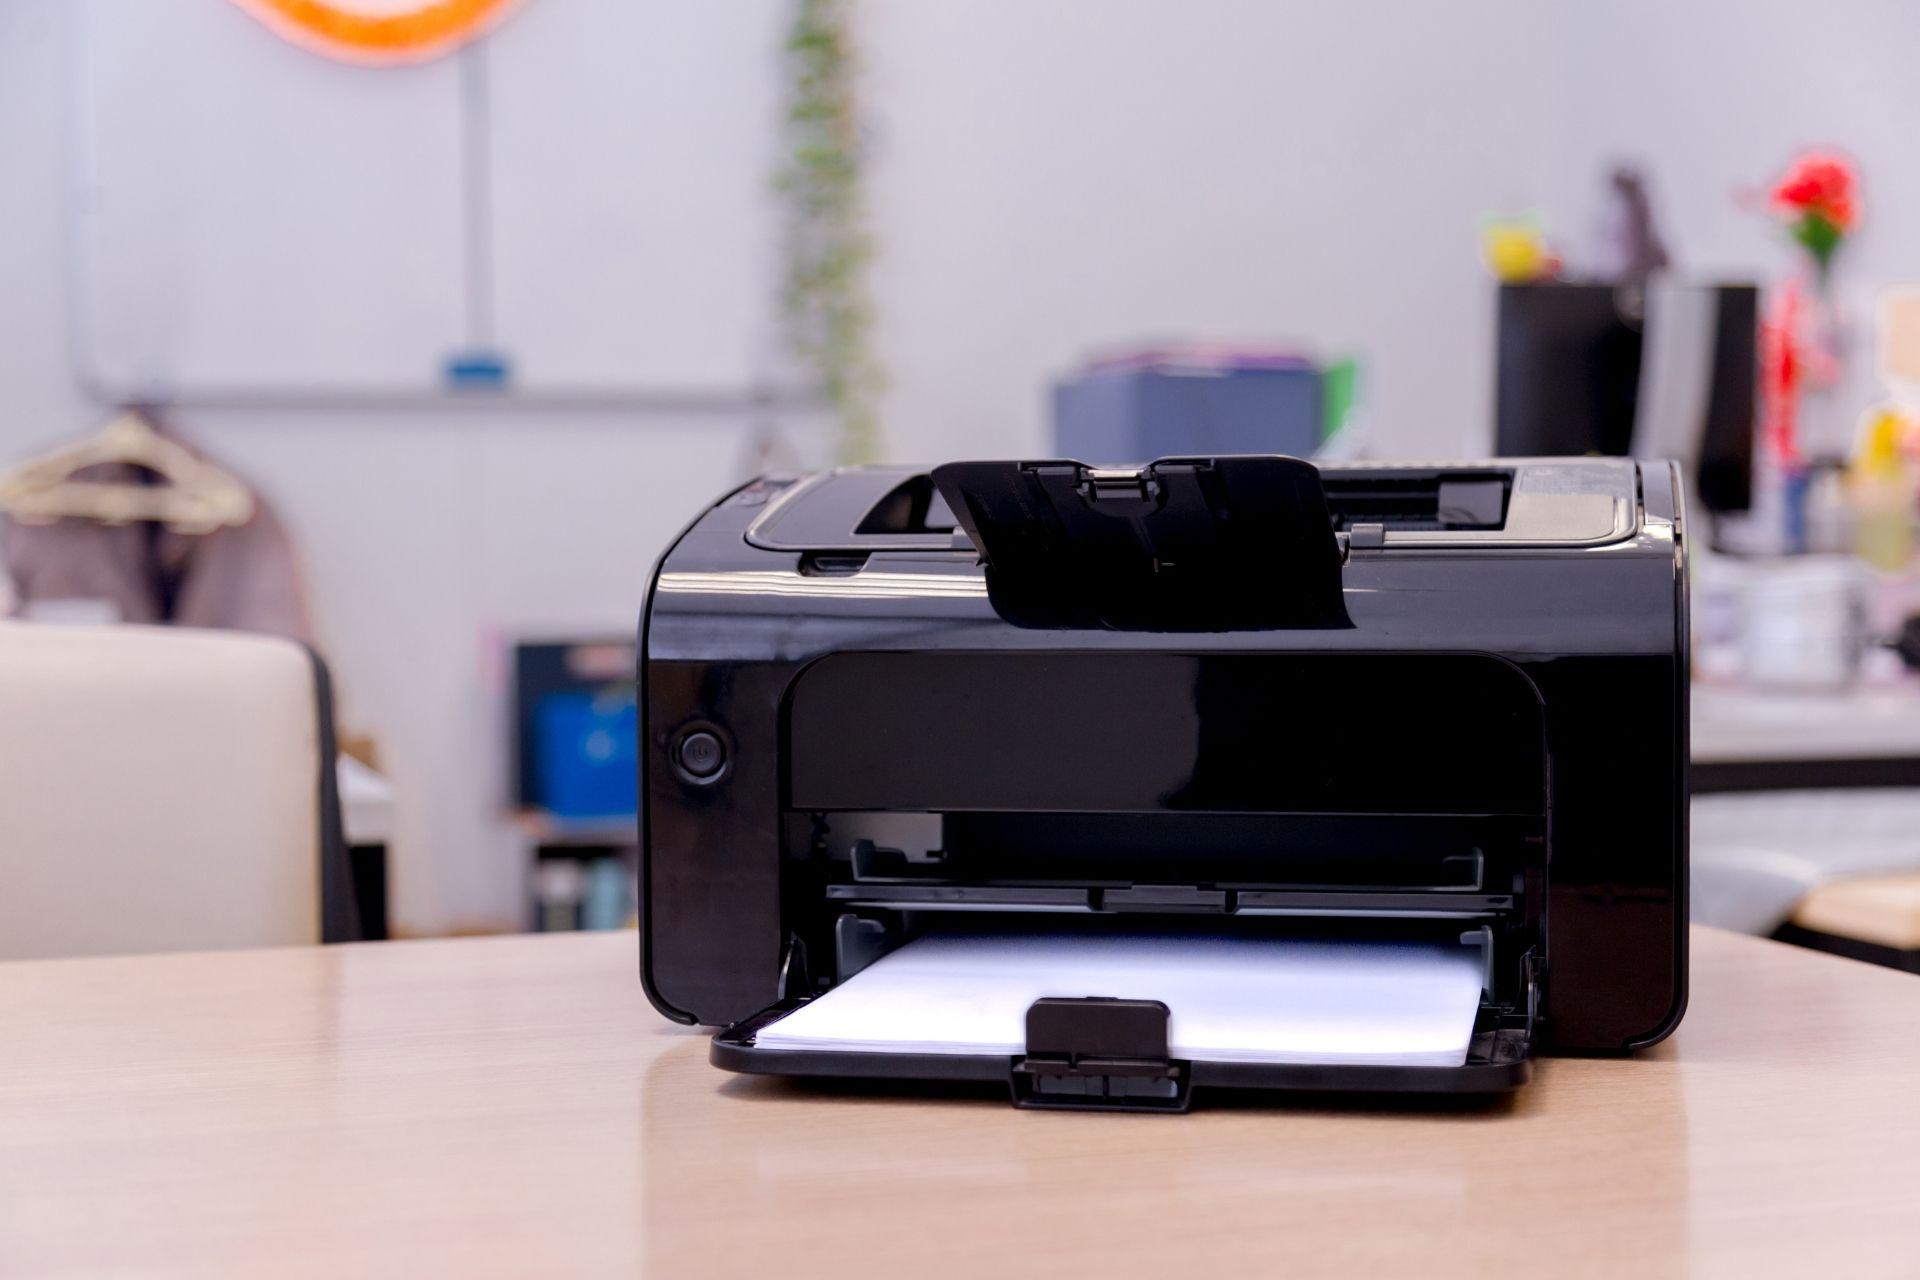 A black printer on an office desk